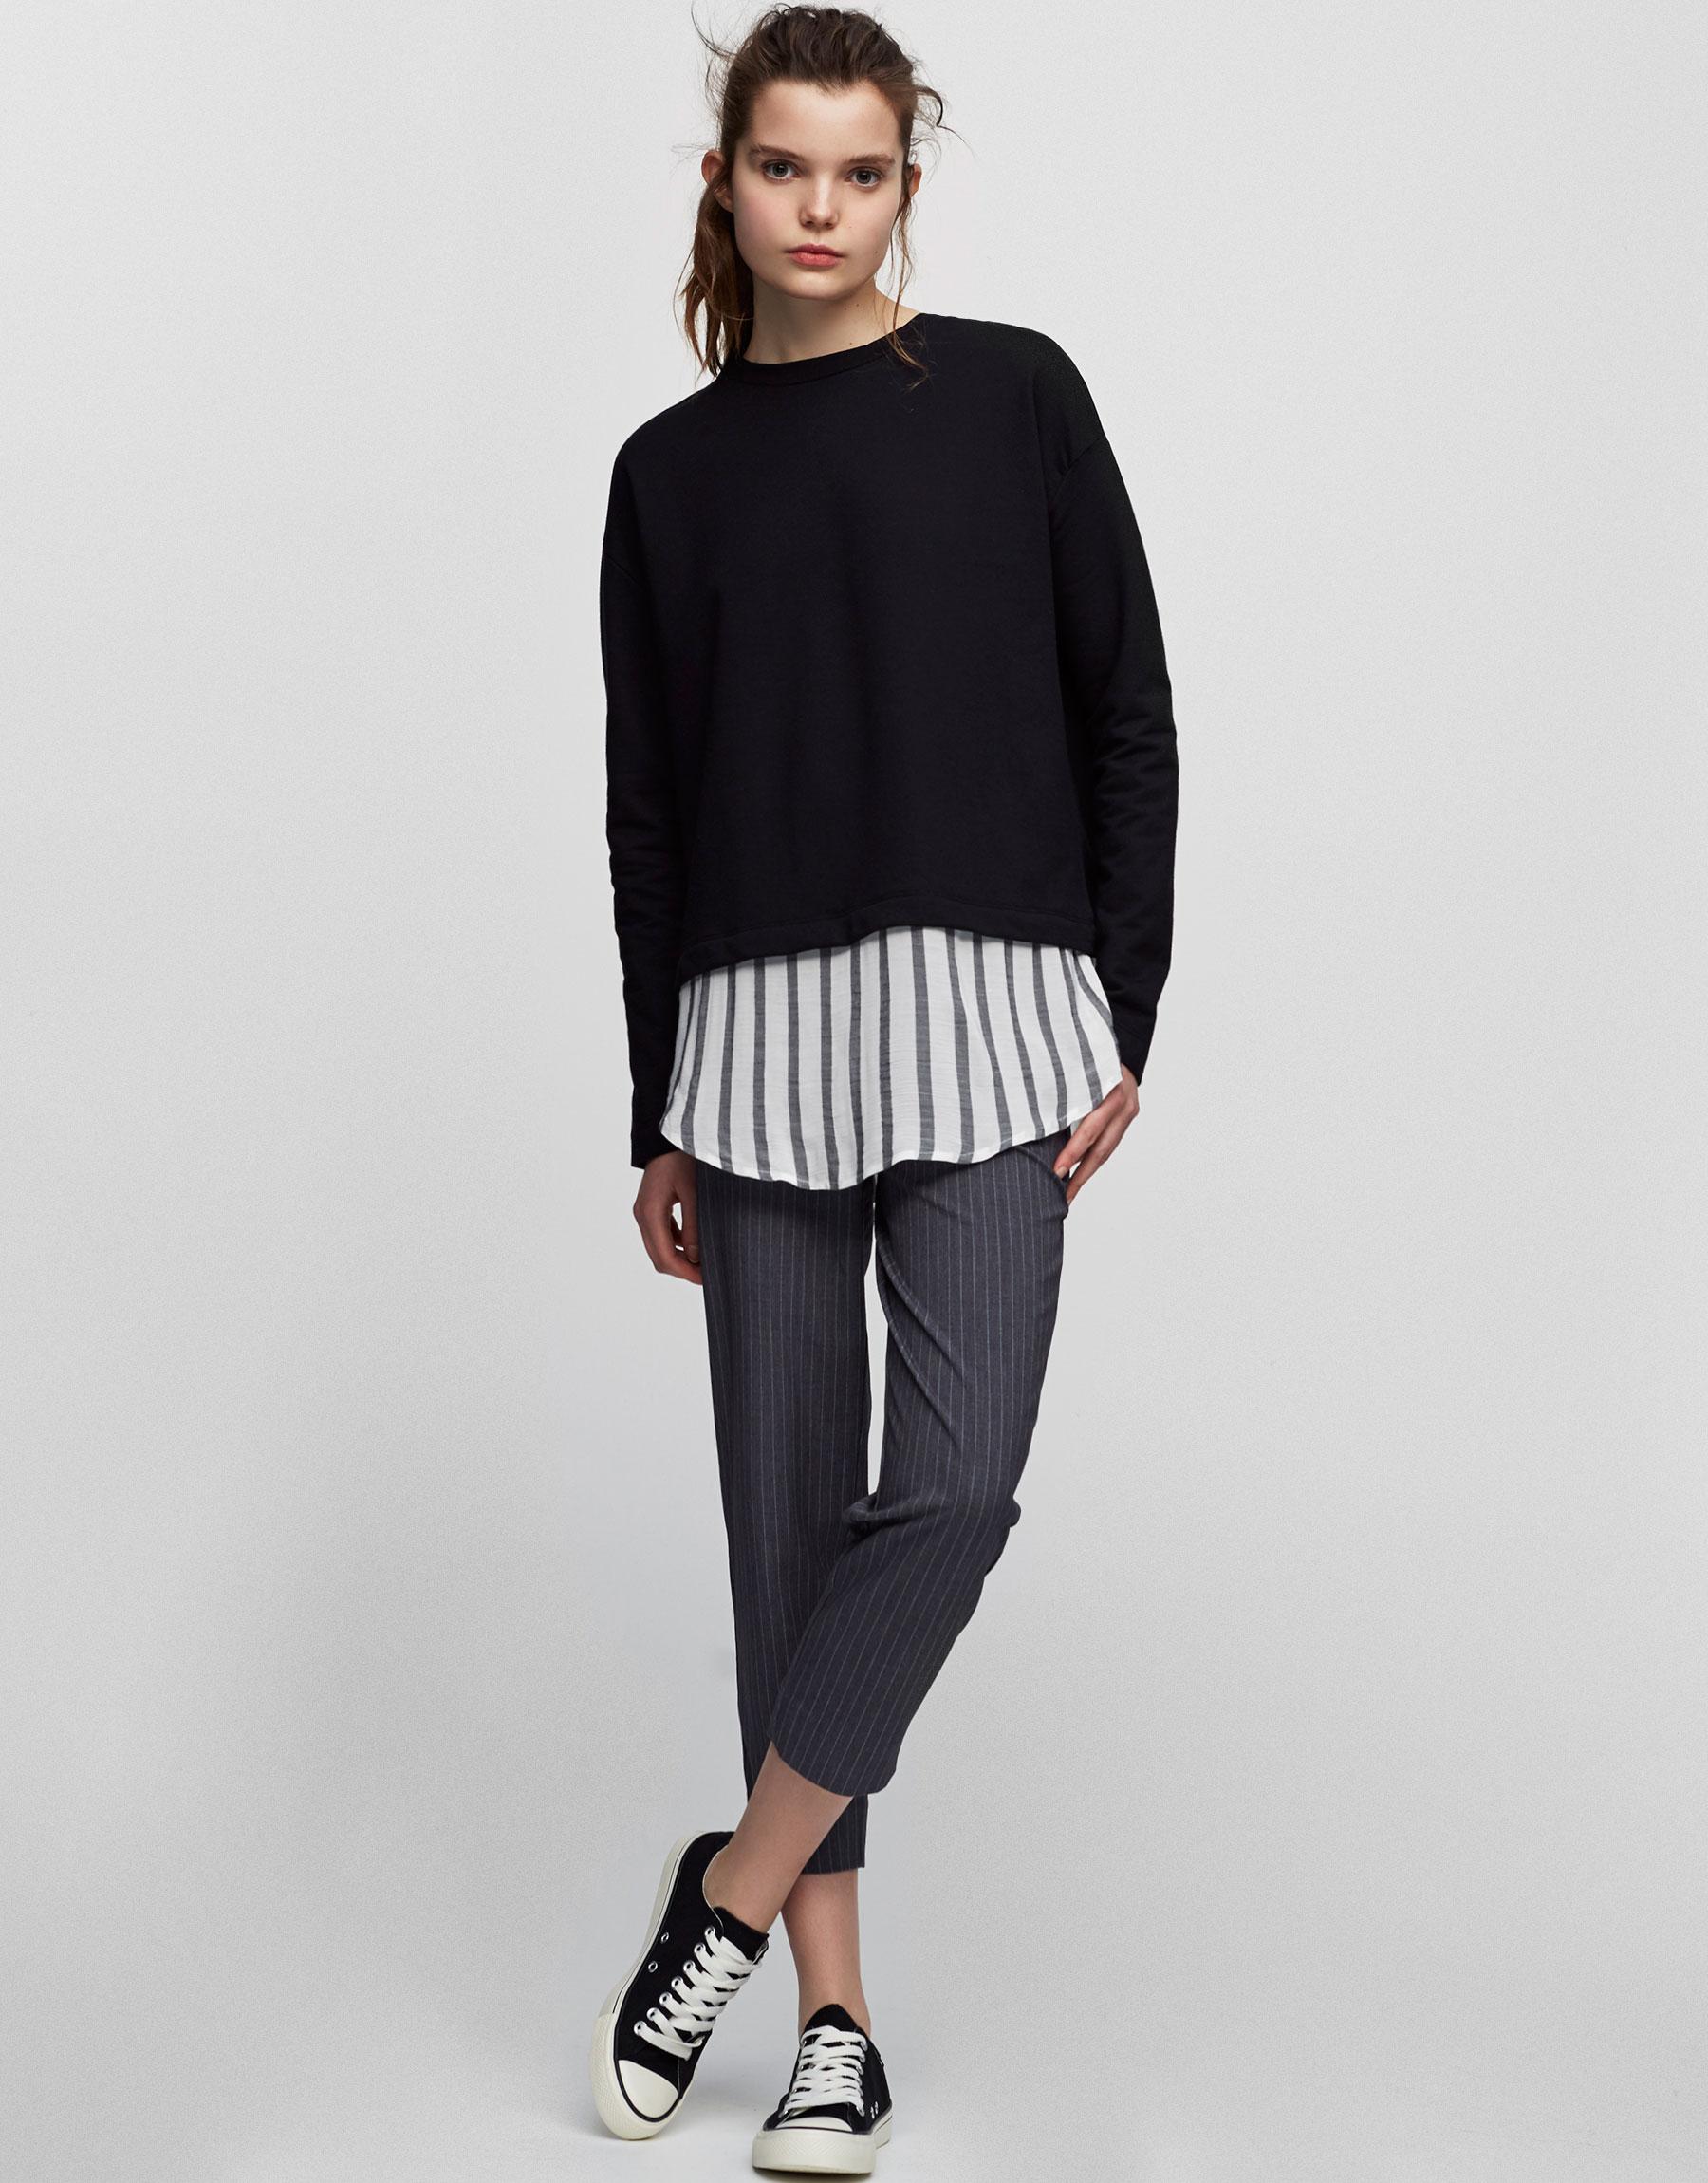 Sweatshirt mit fließendem Hemdsaum